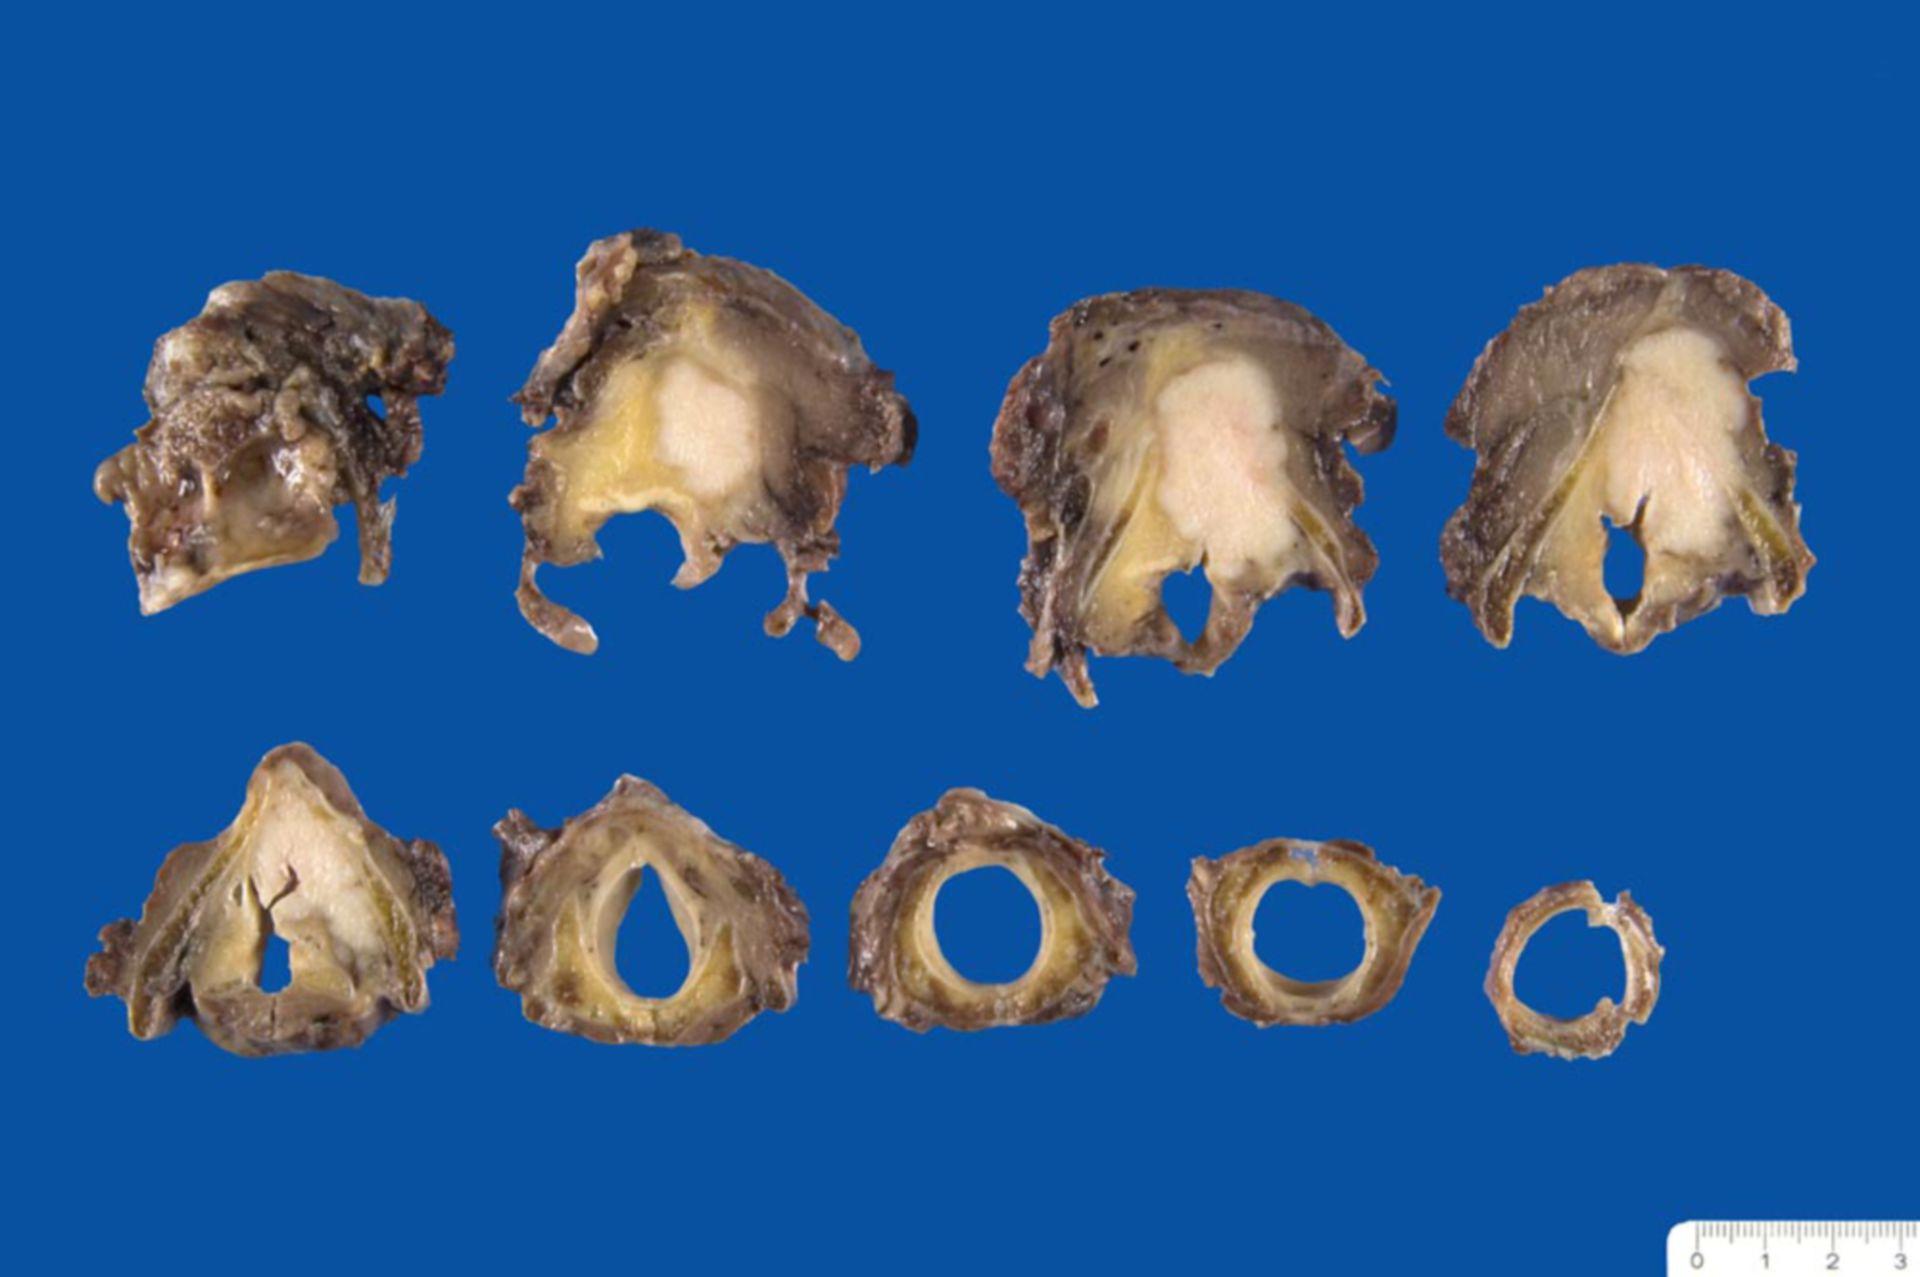 Glottic and supraglottic squamous cell carcinoma of the larynx